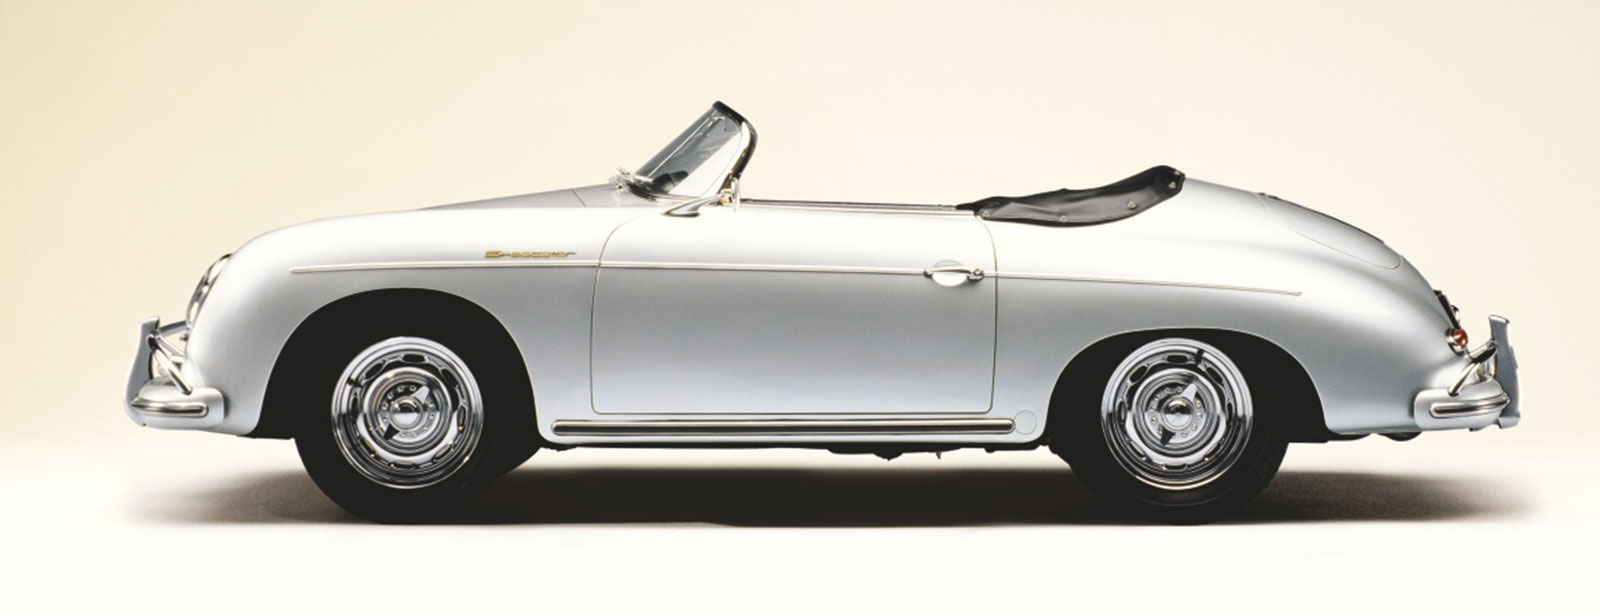 Aktuelle Classic Fahrzeug Angebote